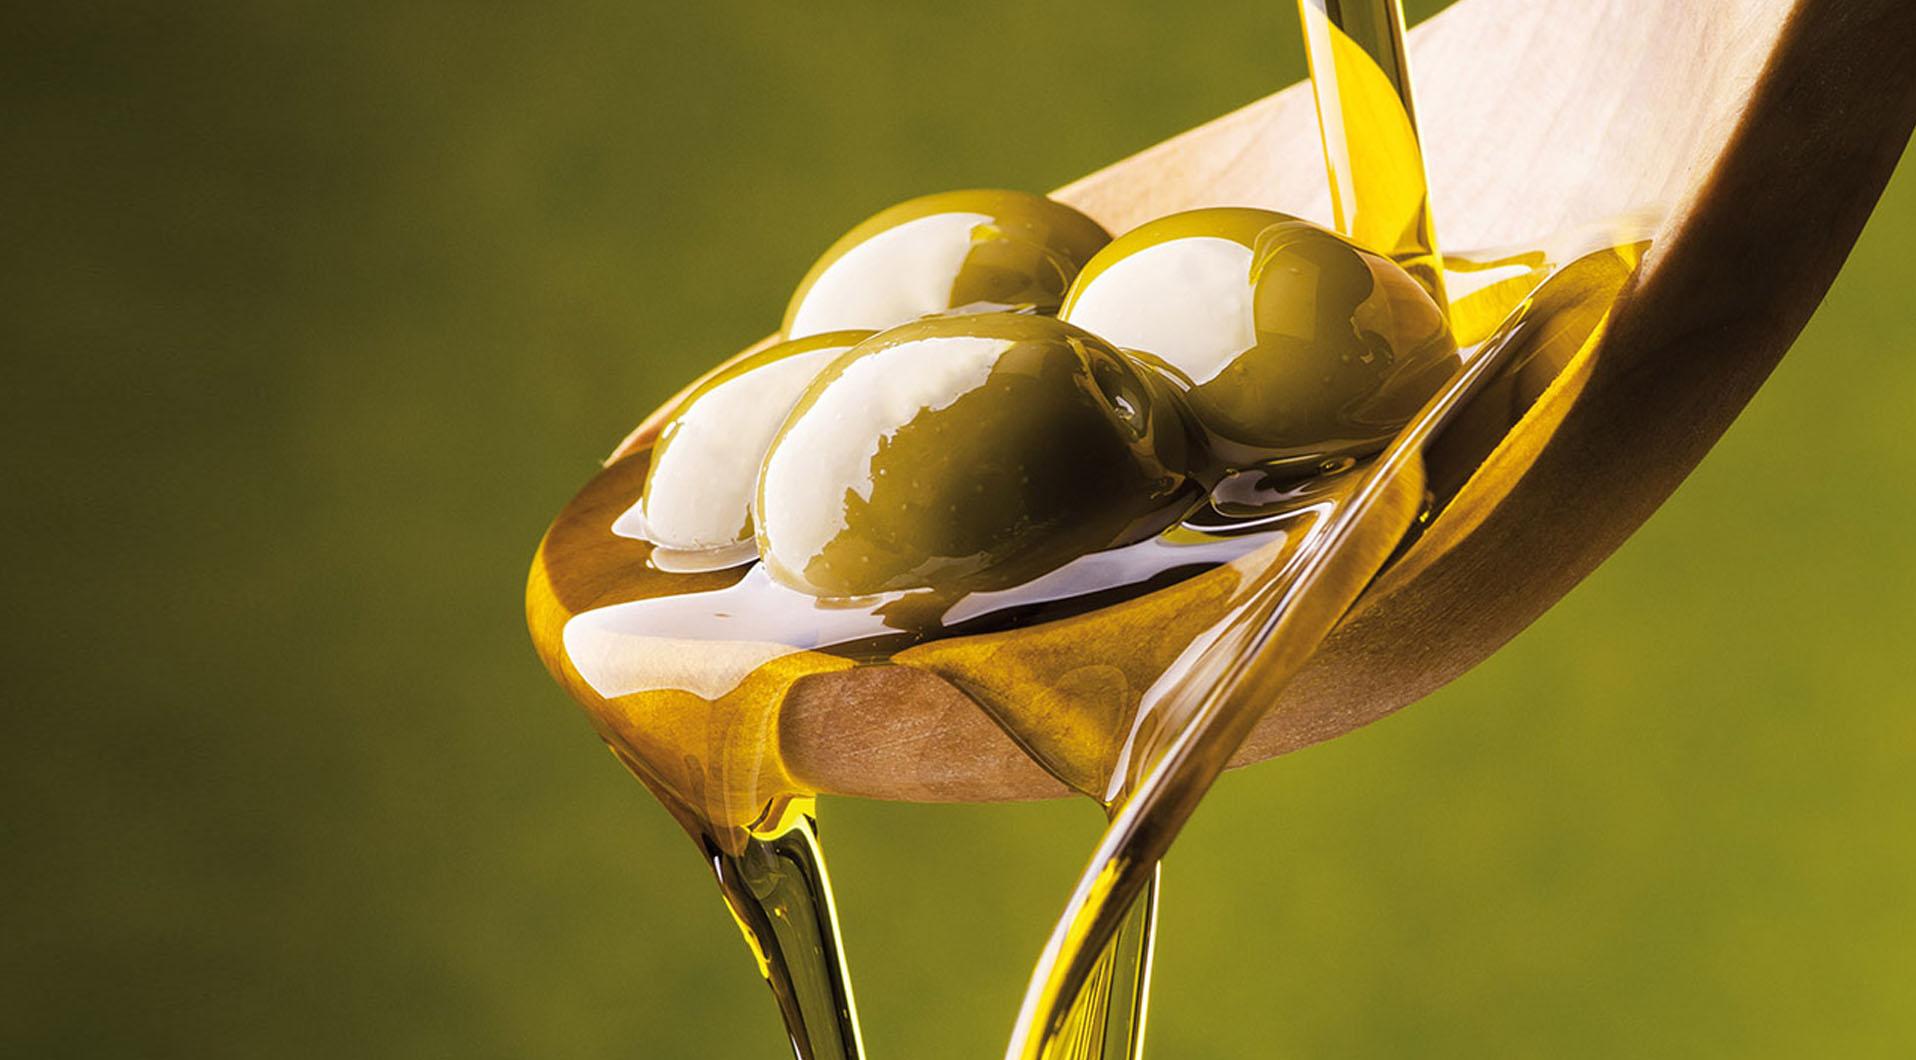 Curiosità sull'olio di oliva